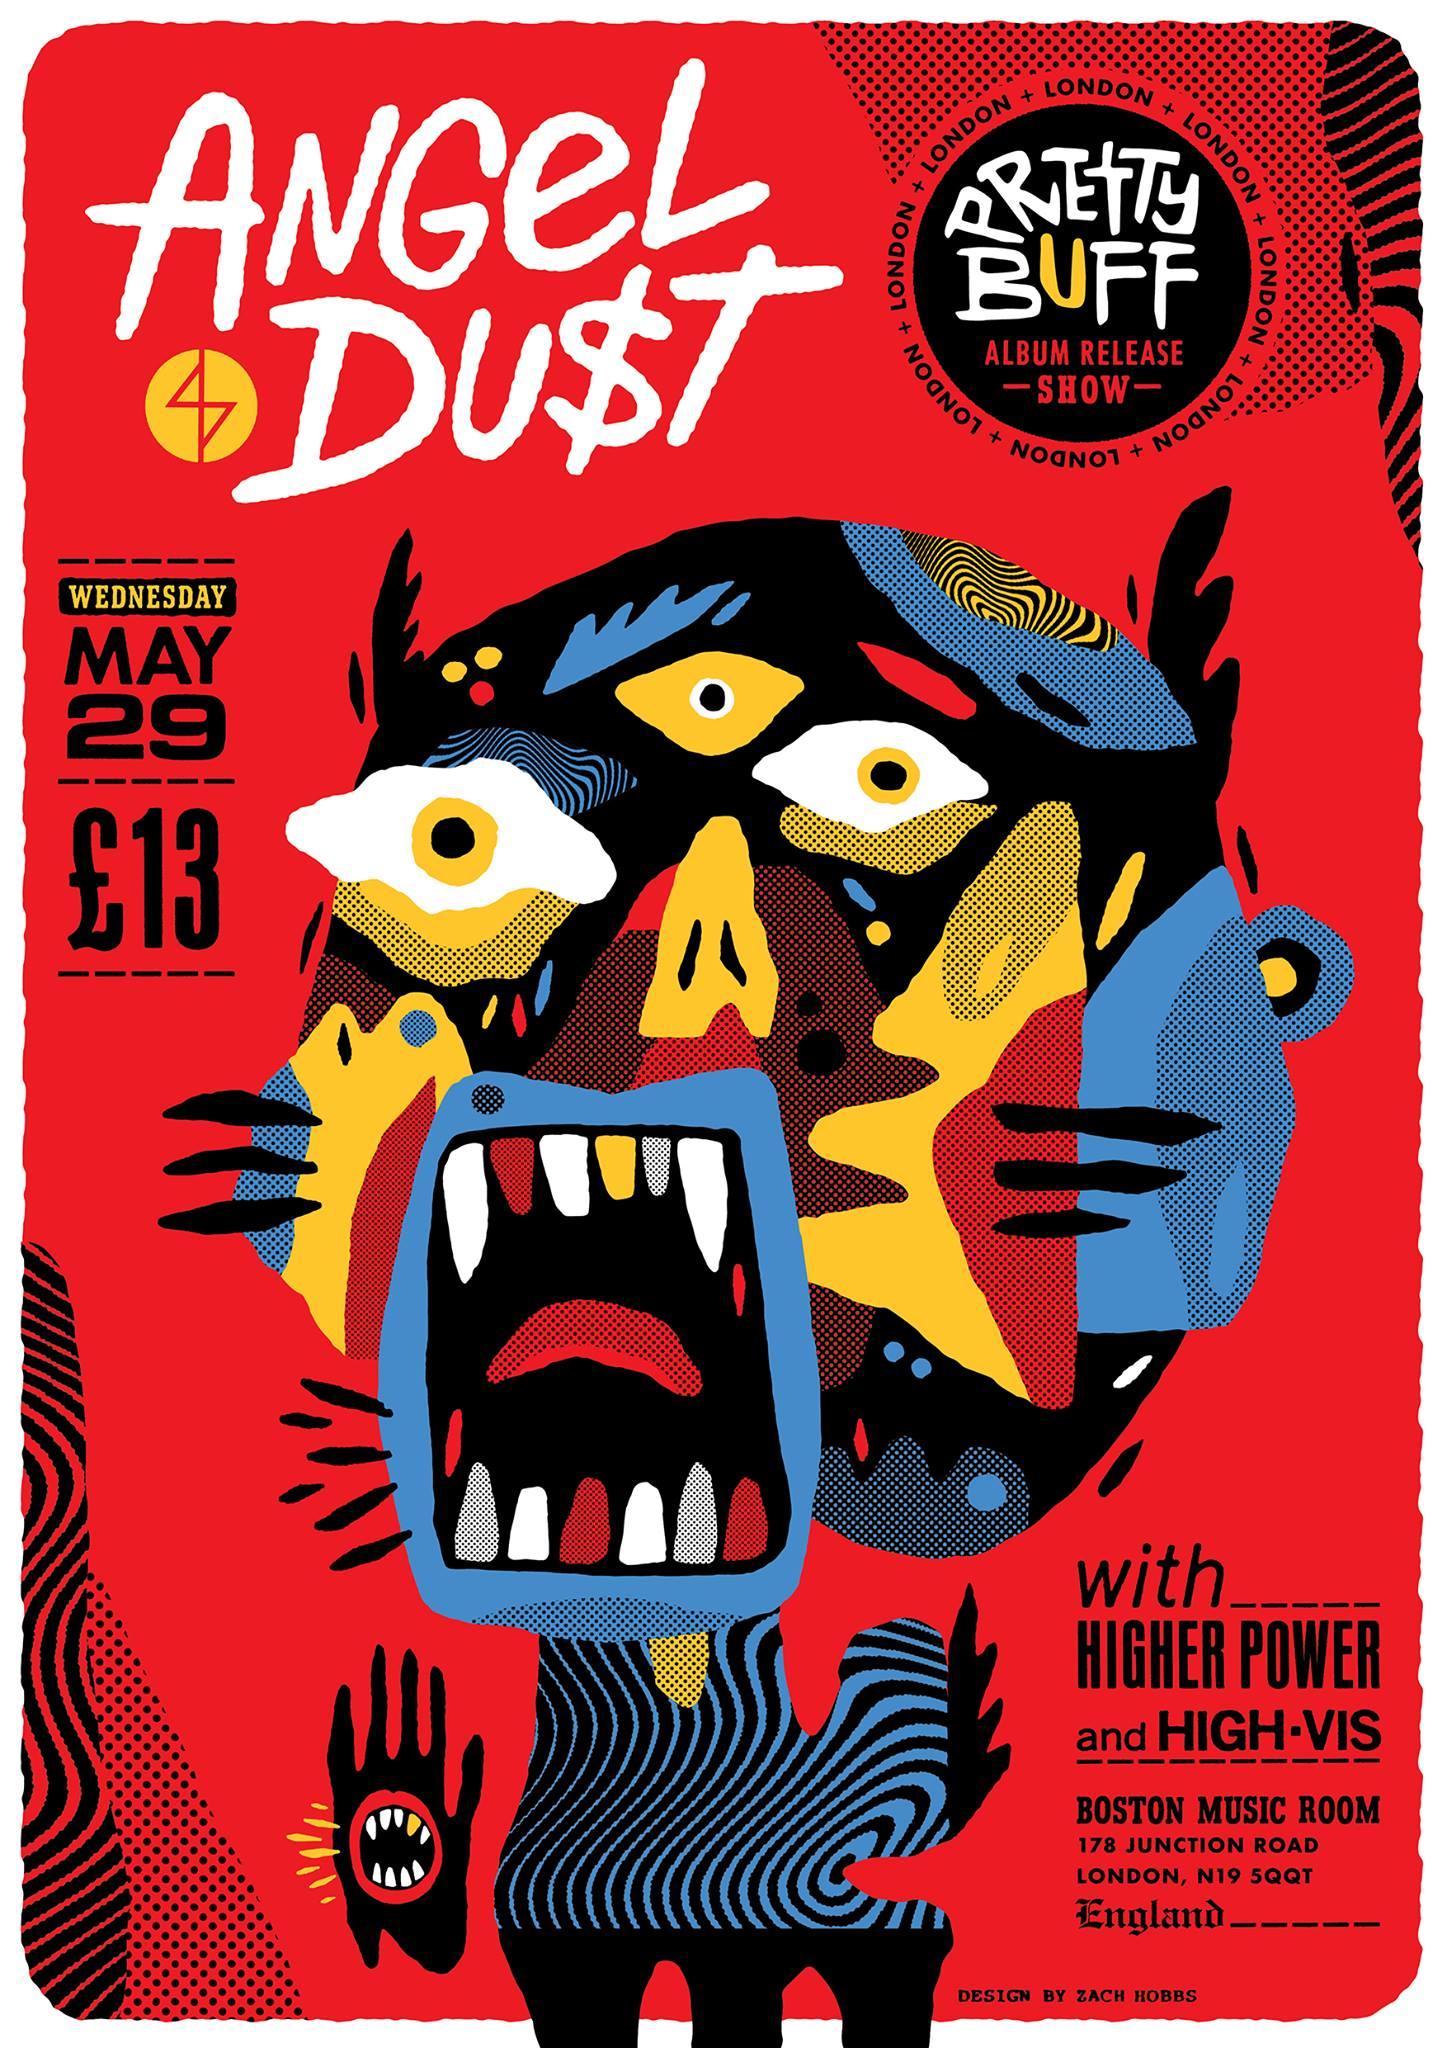 Angel_dust_london_2019_BMR.jpg